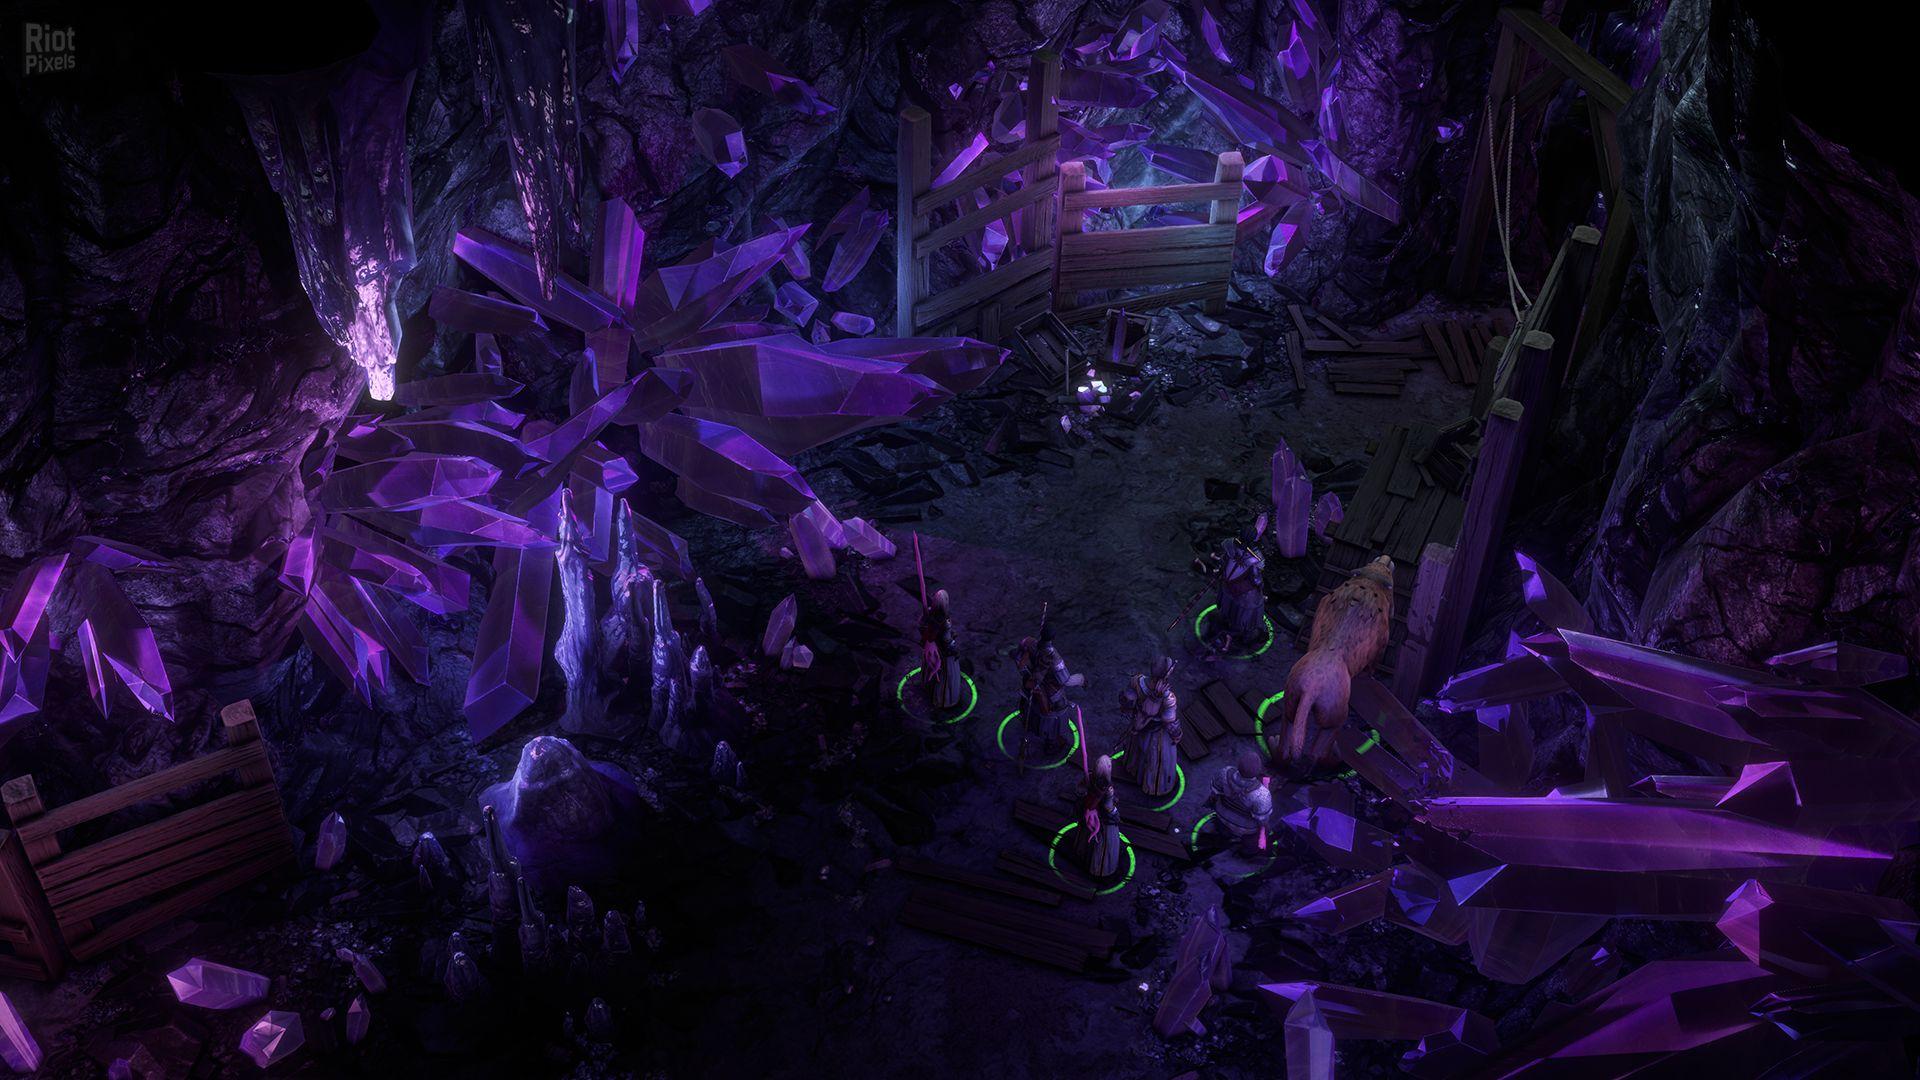 screenshot.pathfinder-wrath-of-the-righteous.1920x1080.2021-02-03.51.jpg